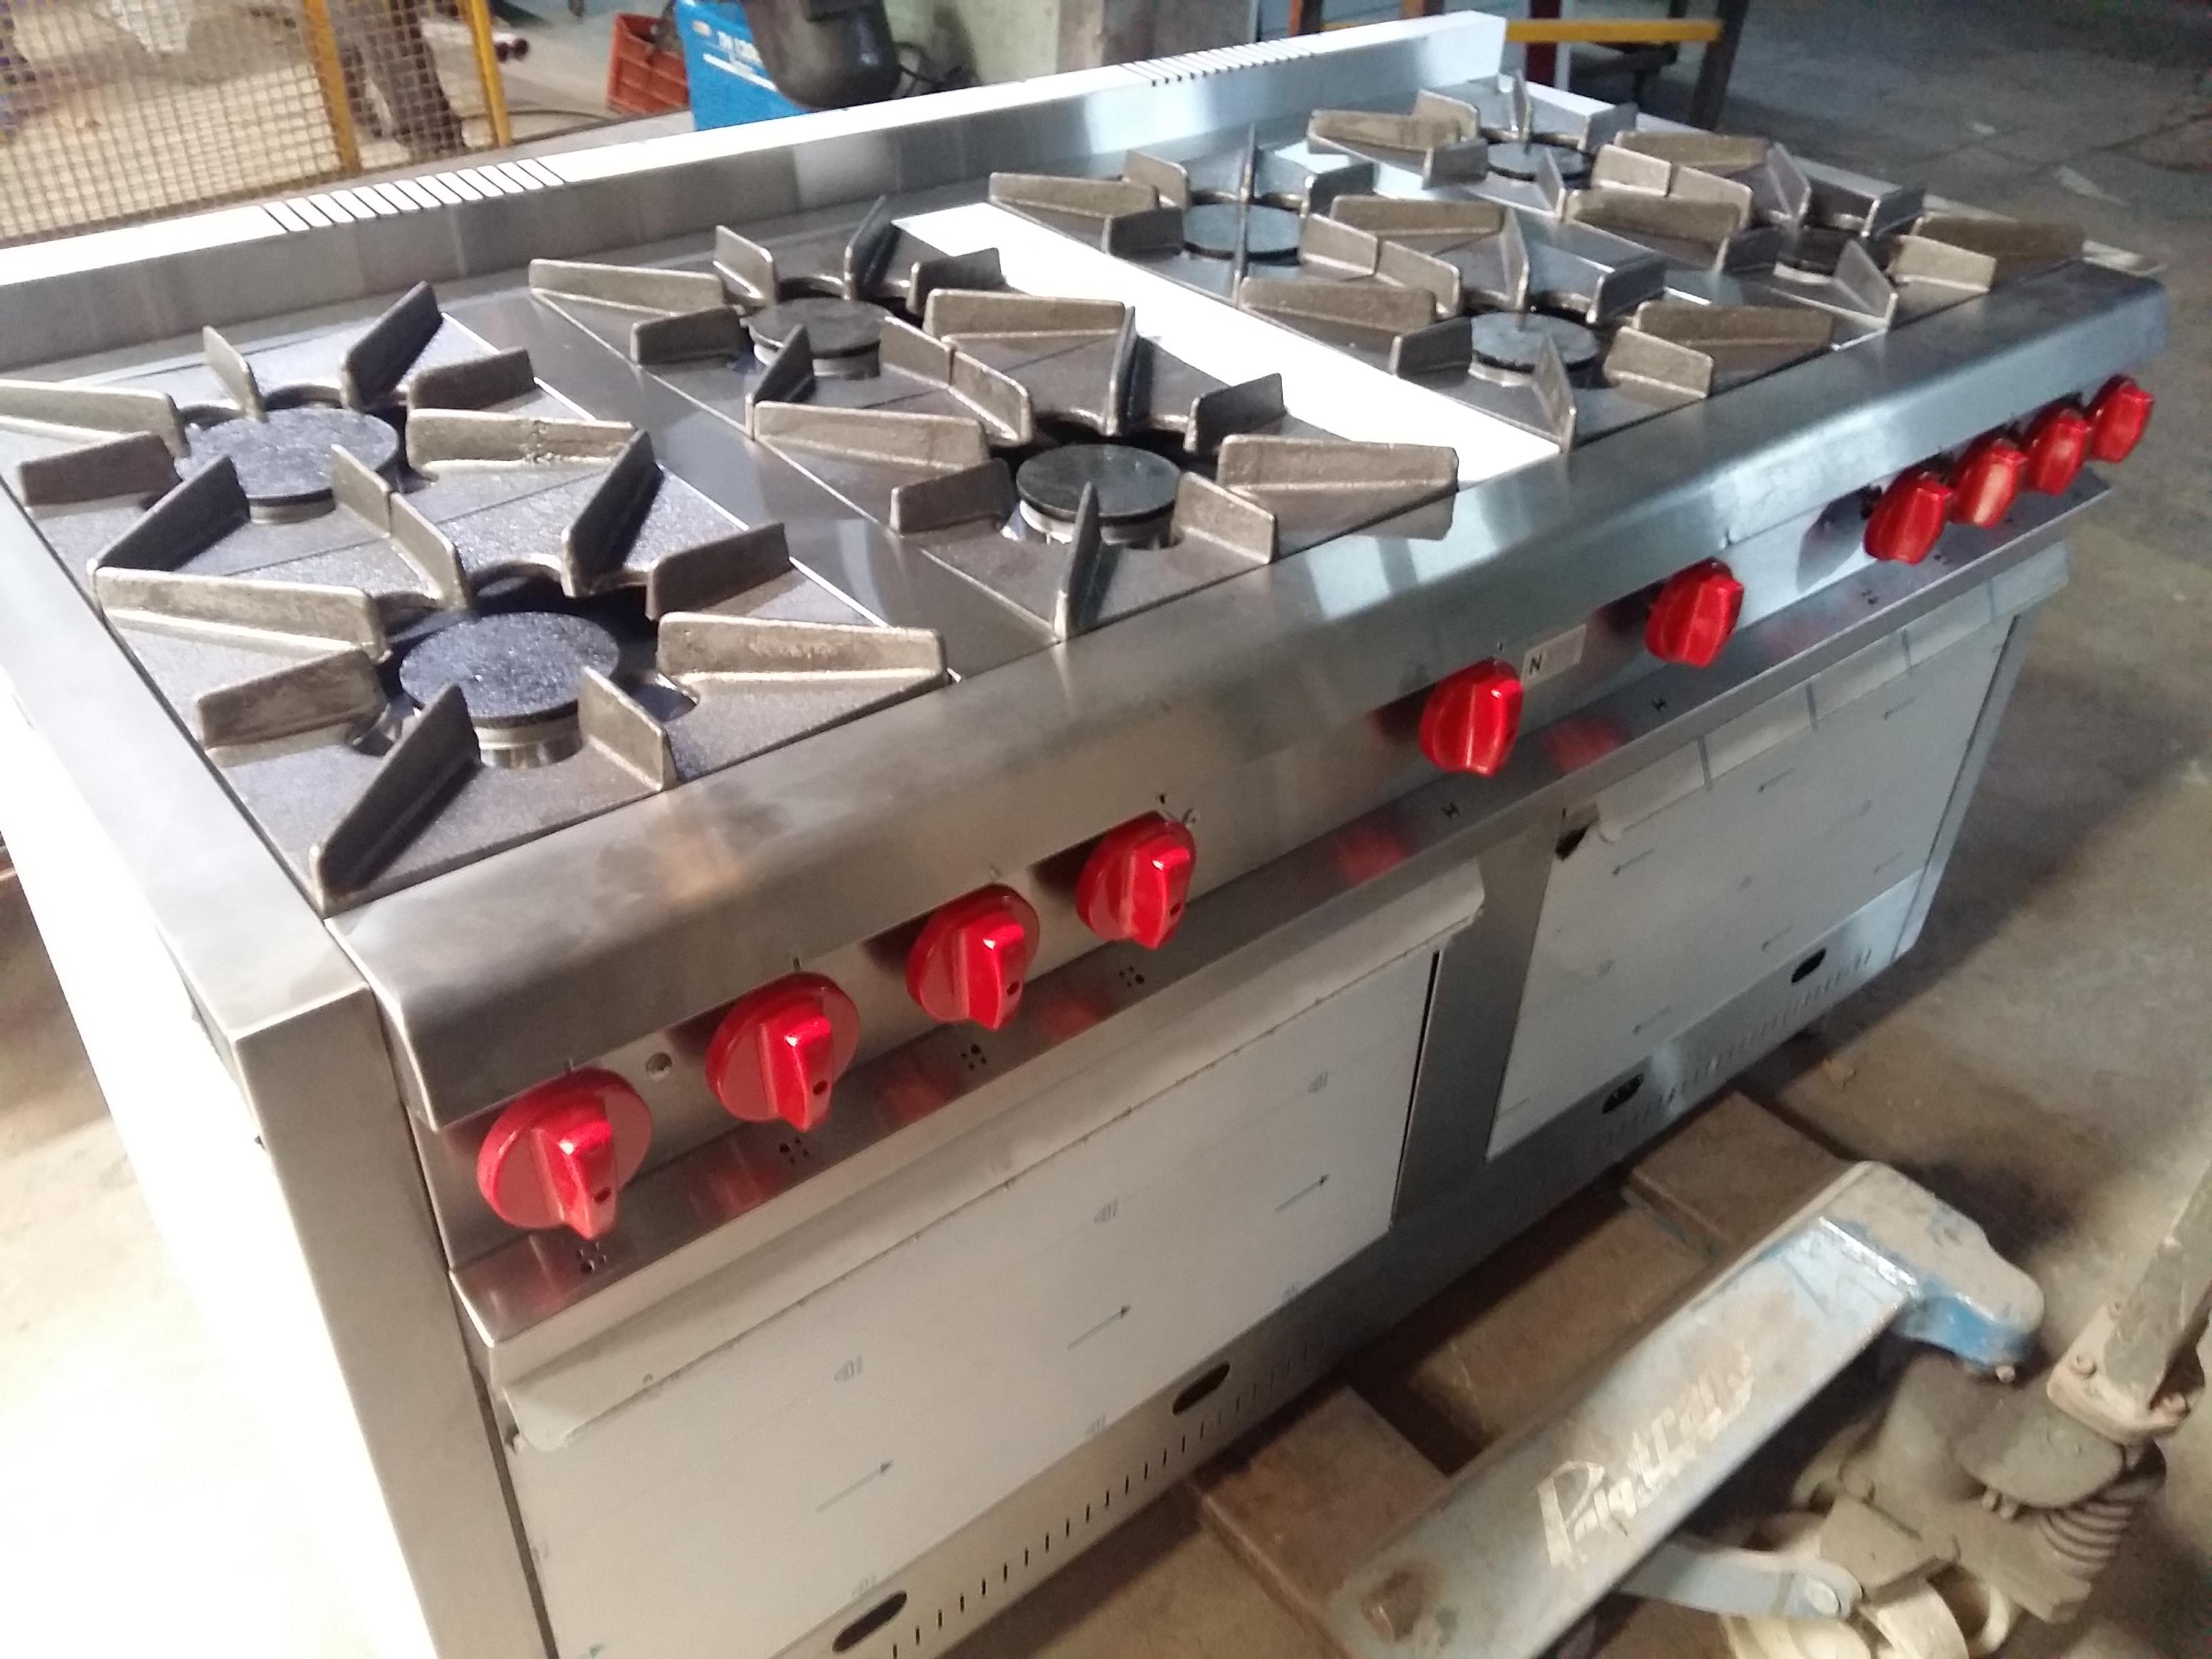 Cocina industrial pesada 8 hornallas dos hornos MGA www.fabricainoxidable.com.ar